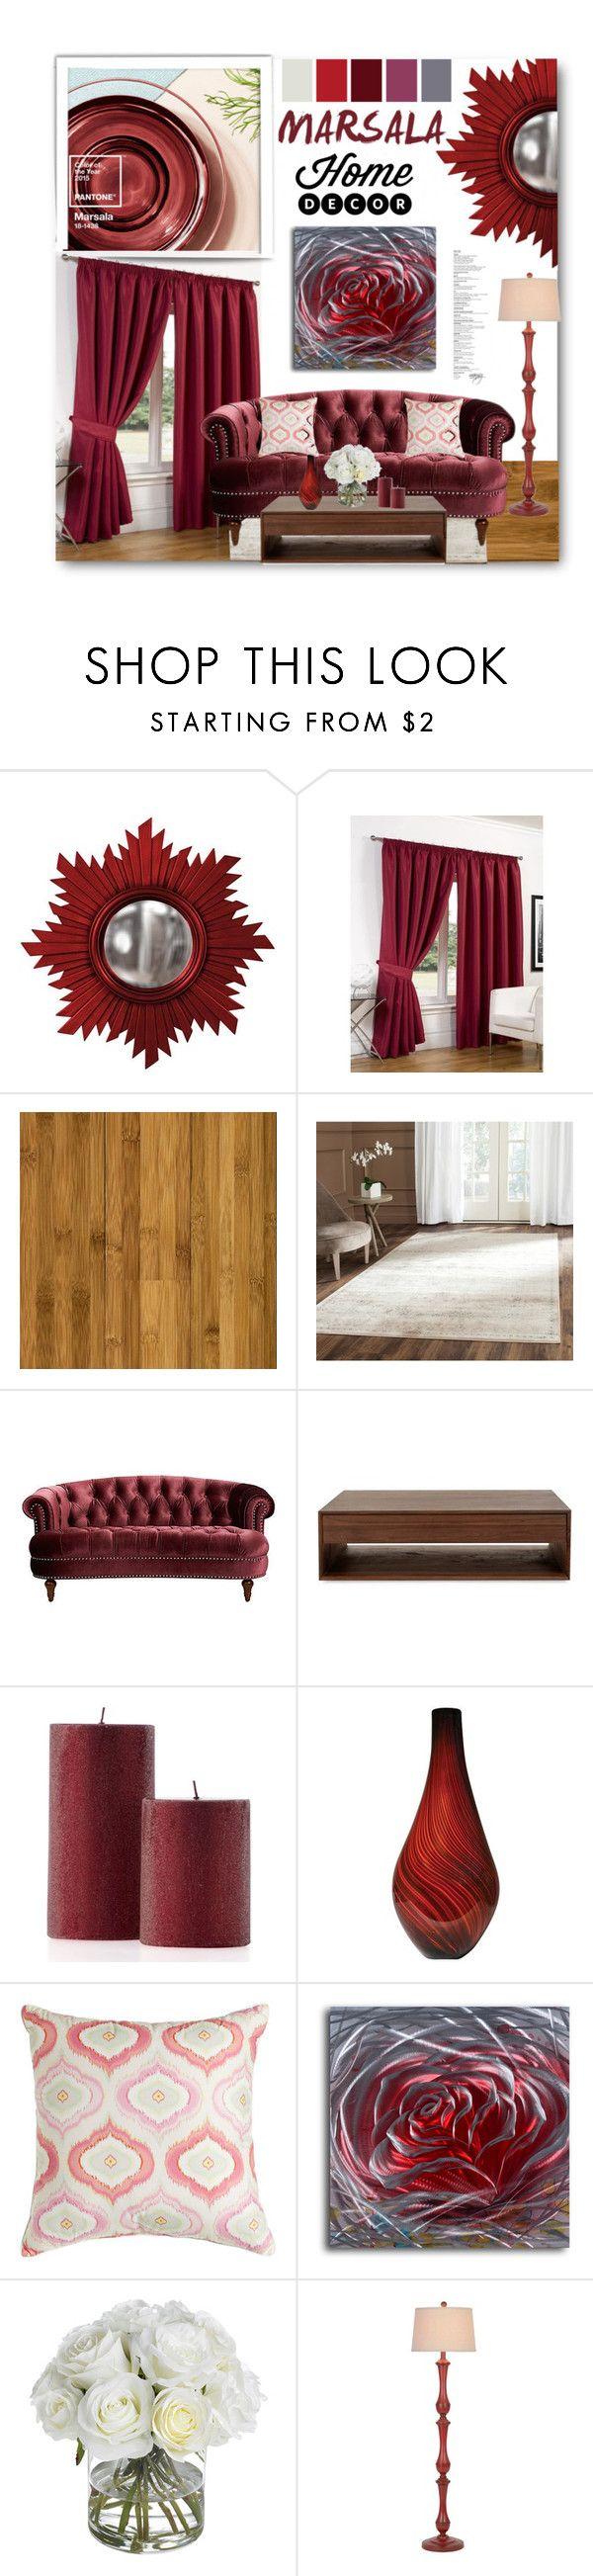 """Marsala Home"" by nansg on Polyvore featuring interior, interiors, interior design, home, home decor, interior decorating, Home Decorators Collection, Safavieh, Dena Home and Diane James"